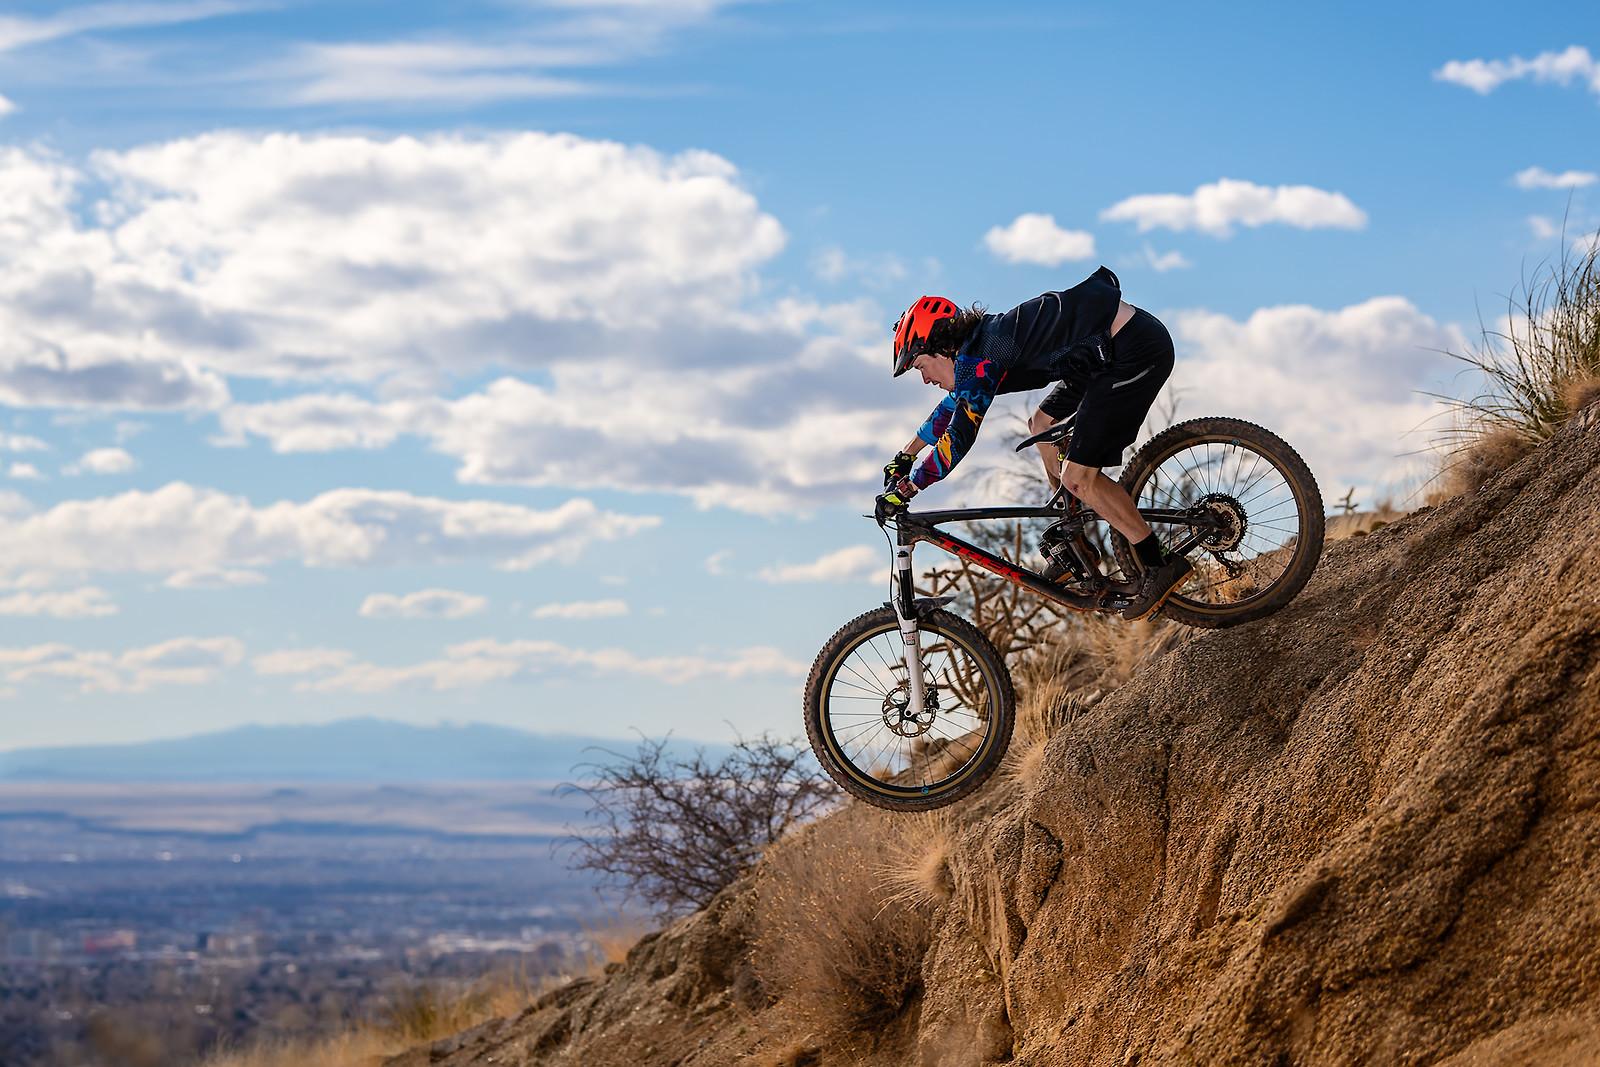 JJ-ABQfoothills - Curtis Gillen - Mountain Biking Pictures - Vital MTB